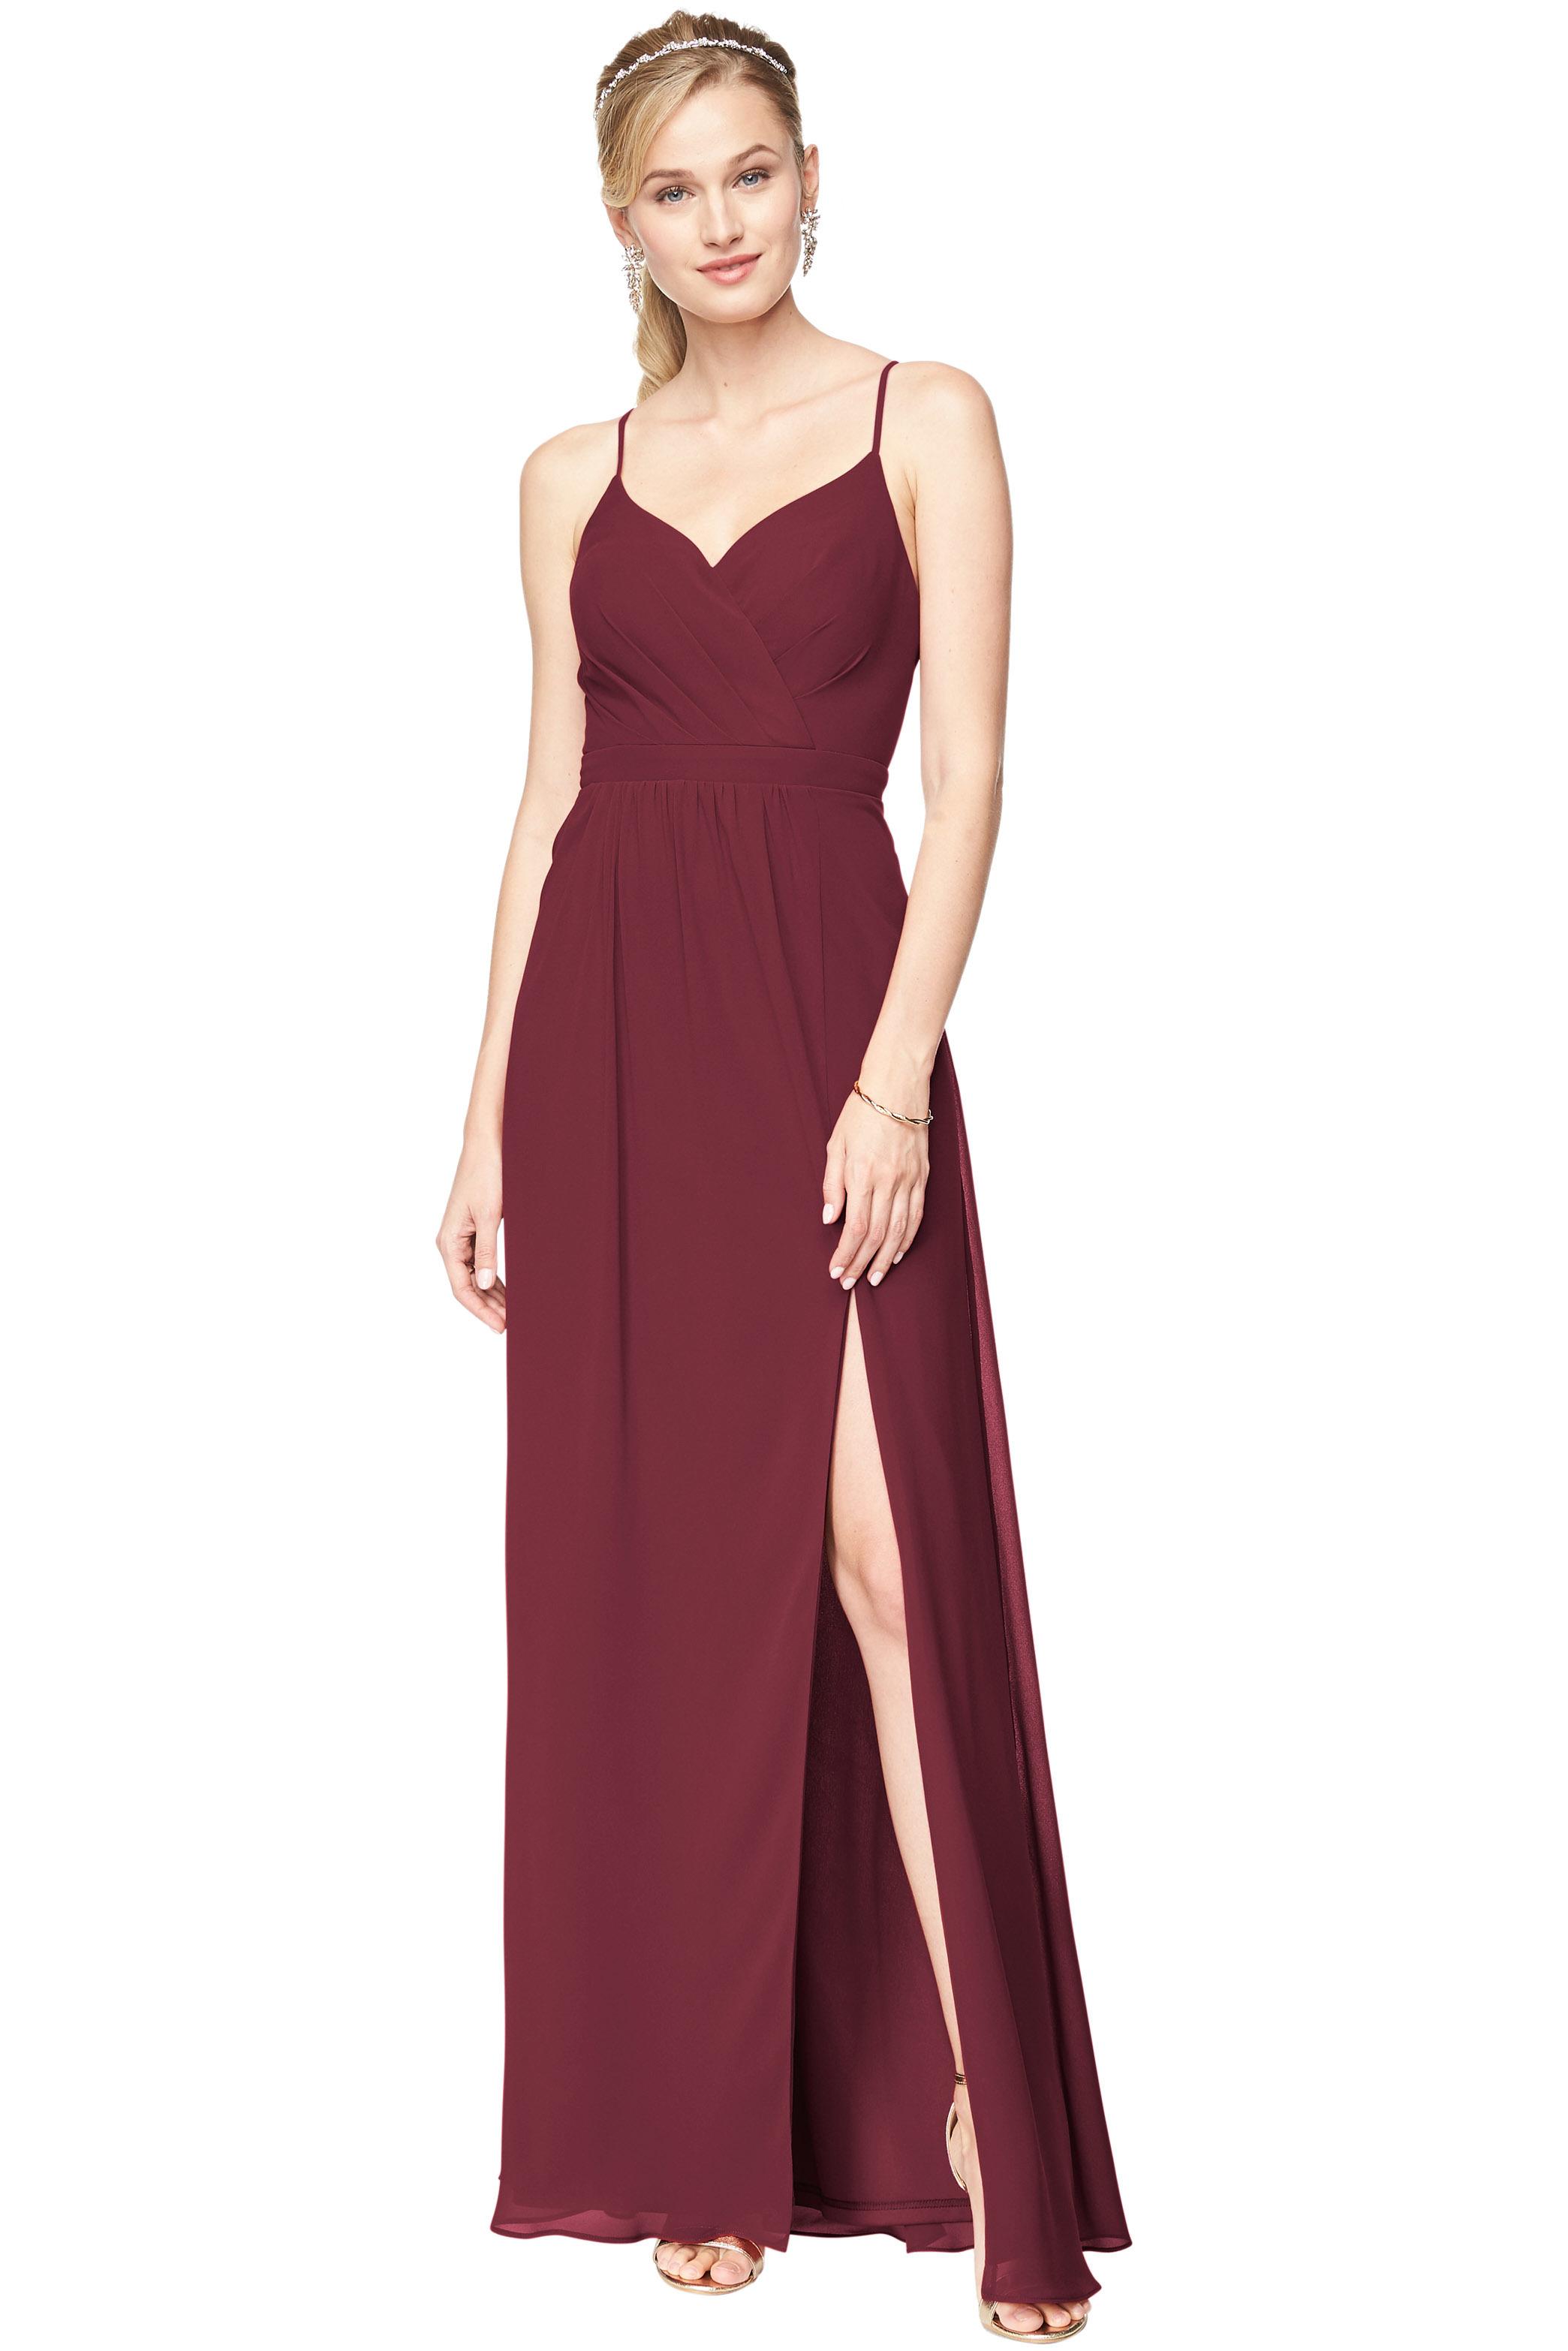 Bill Levkoff WINE Chiffon Surplice A-Line gown, $178.00 Front